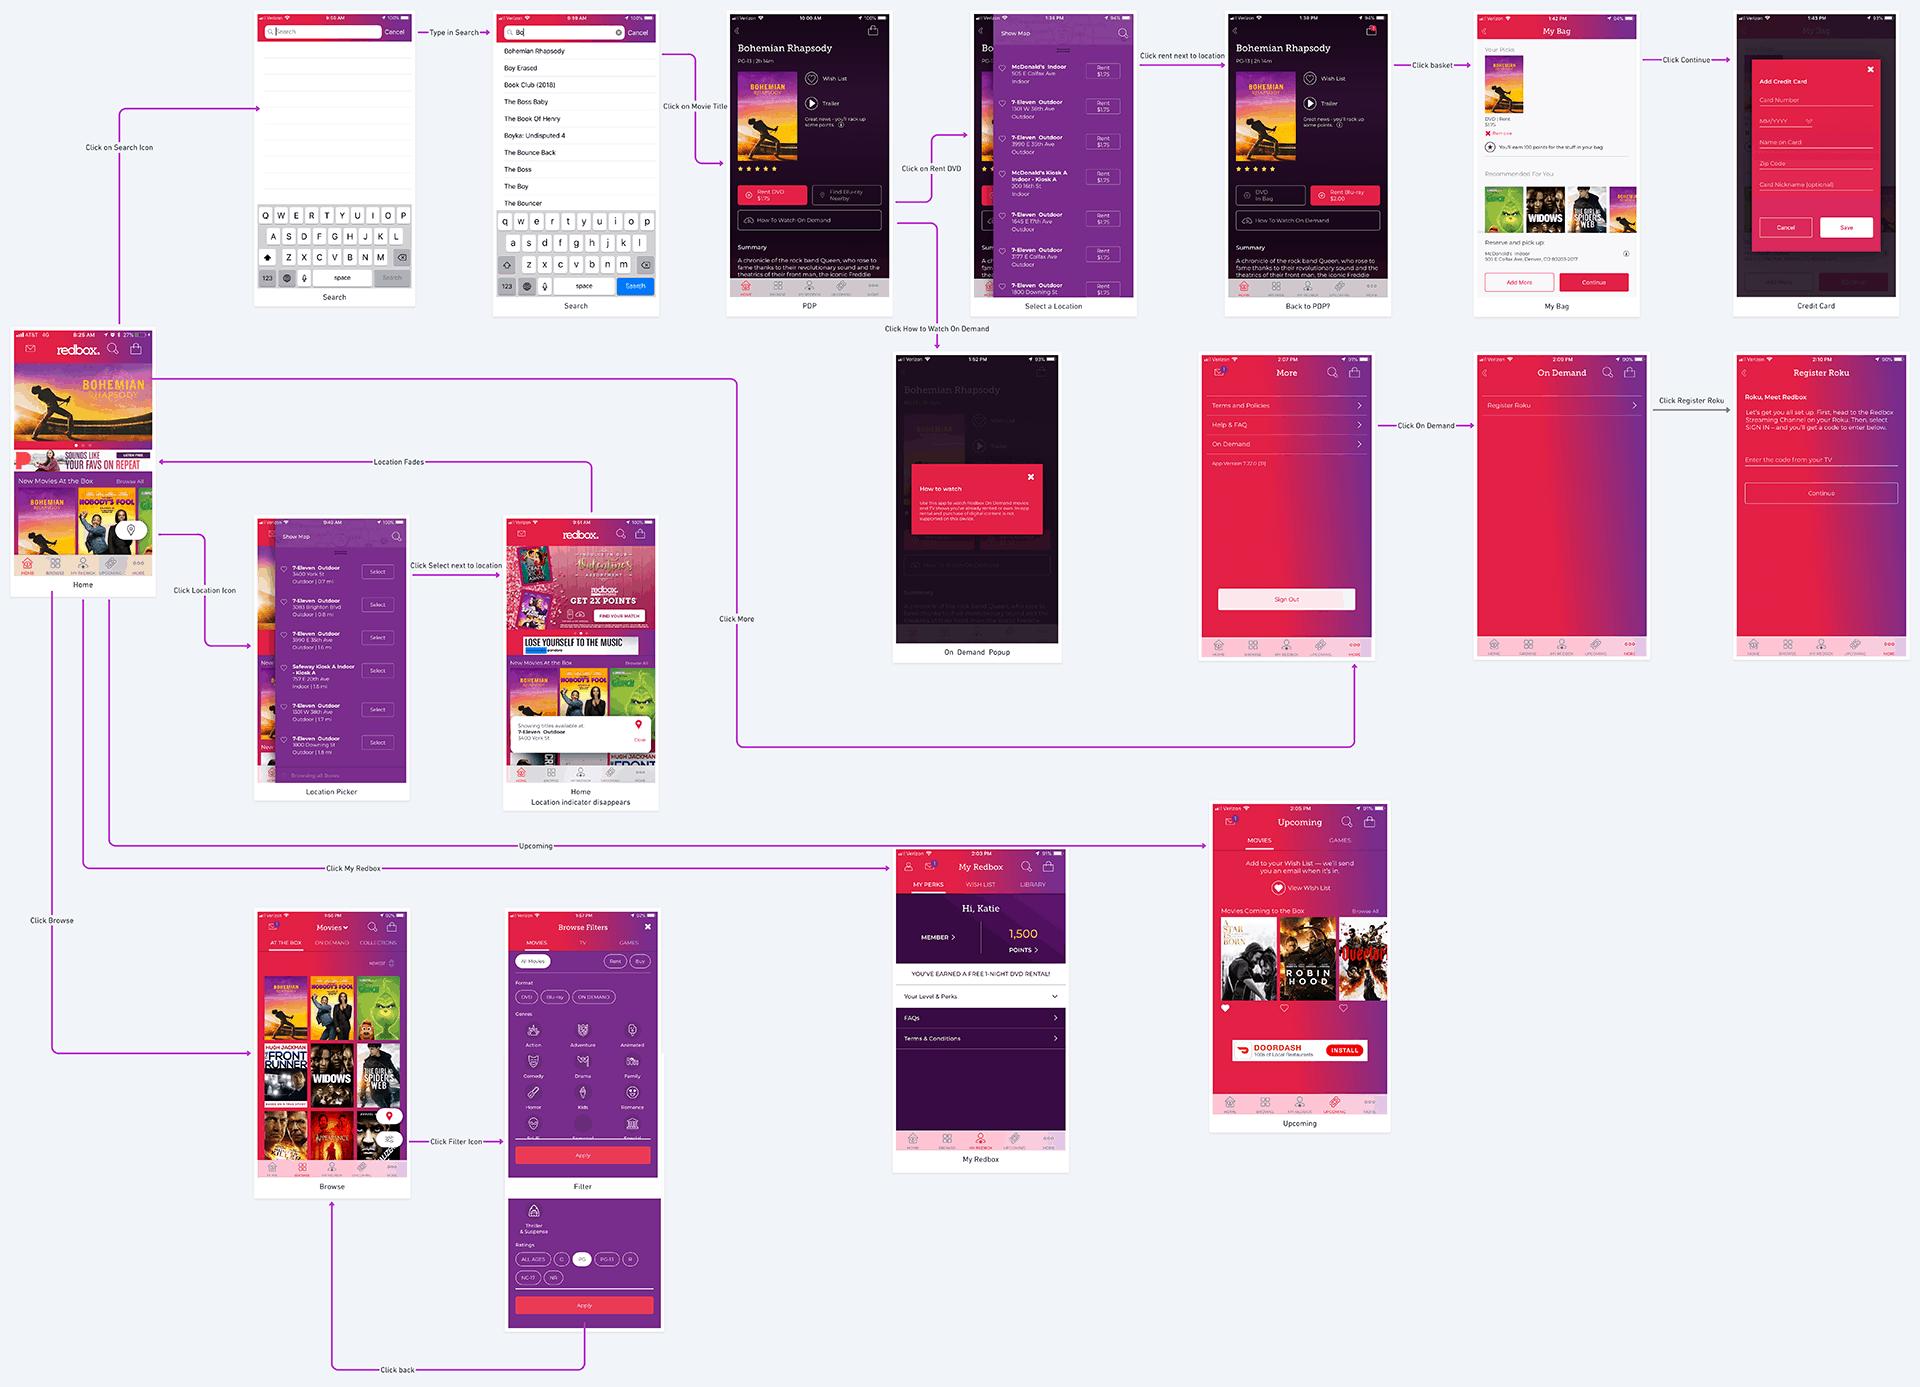 Redbox Confusing Userflows